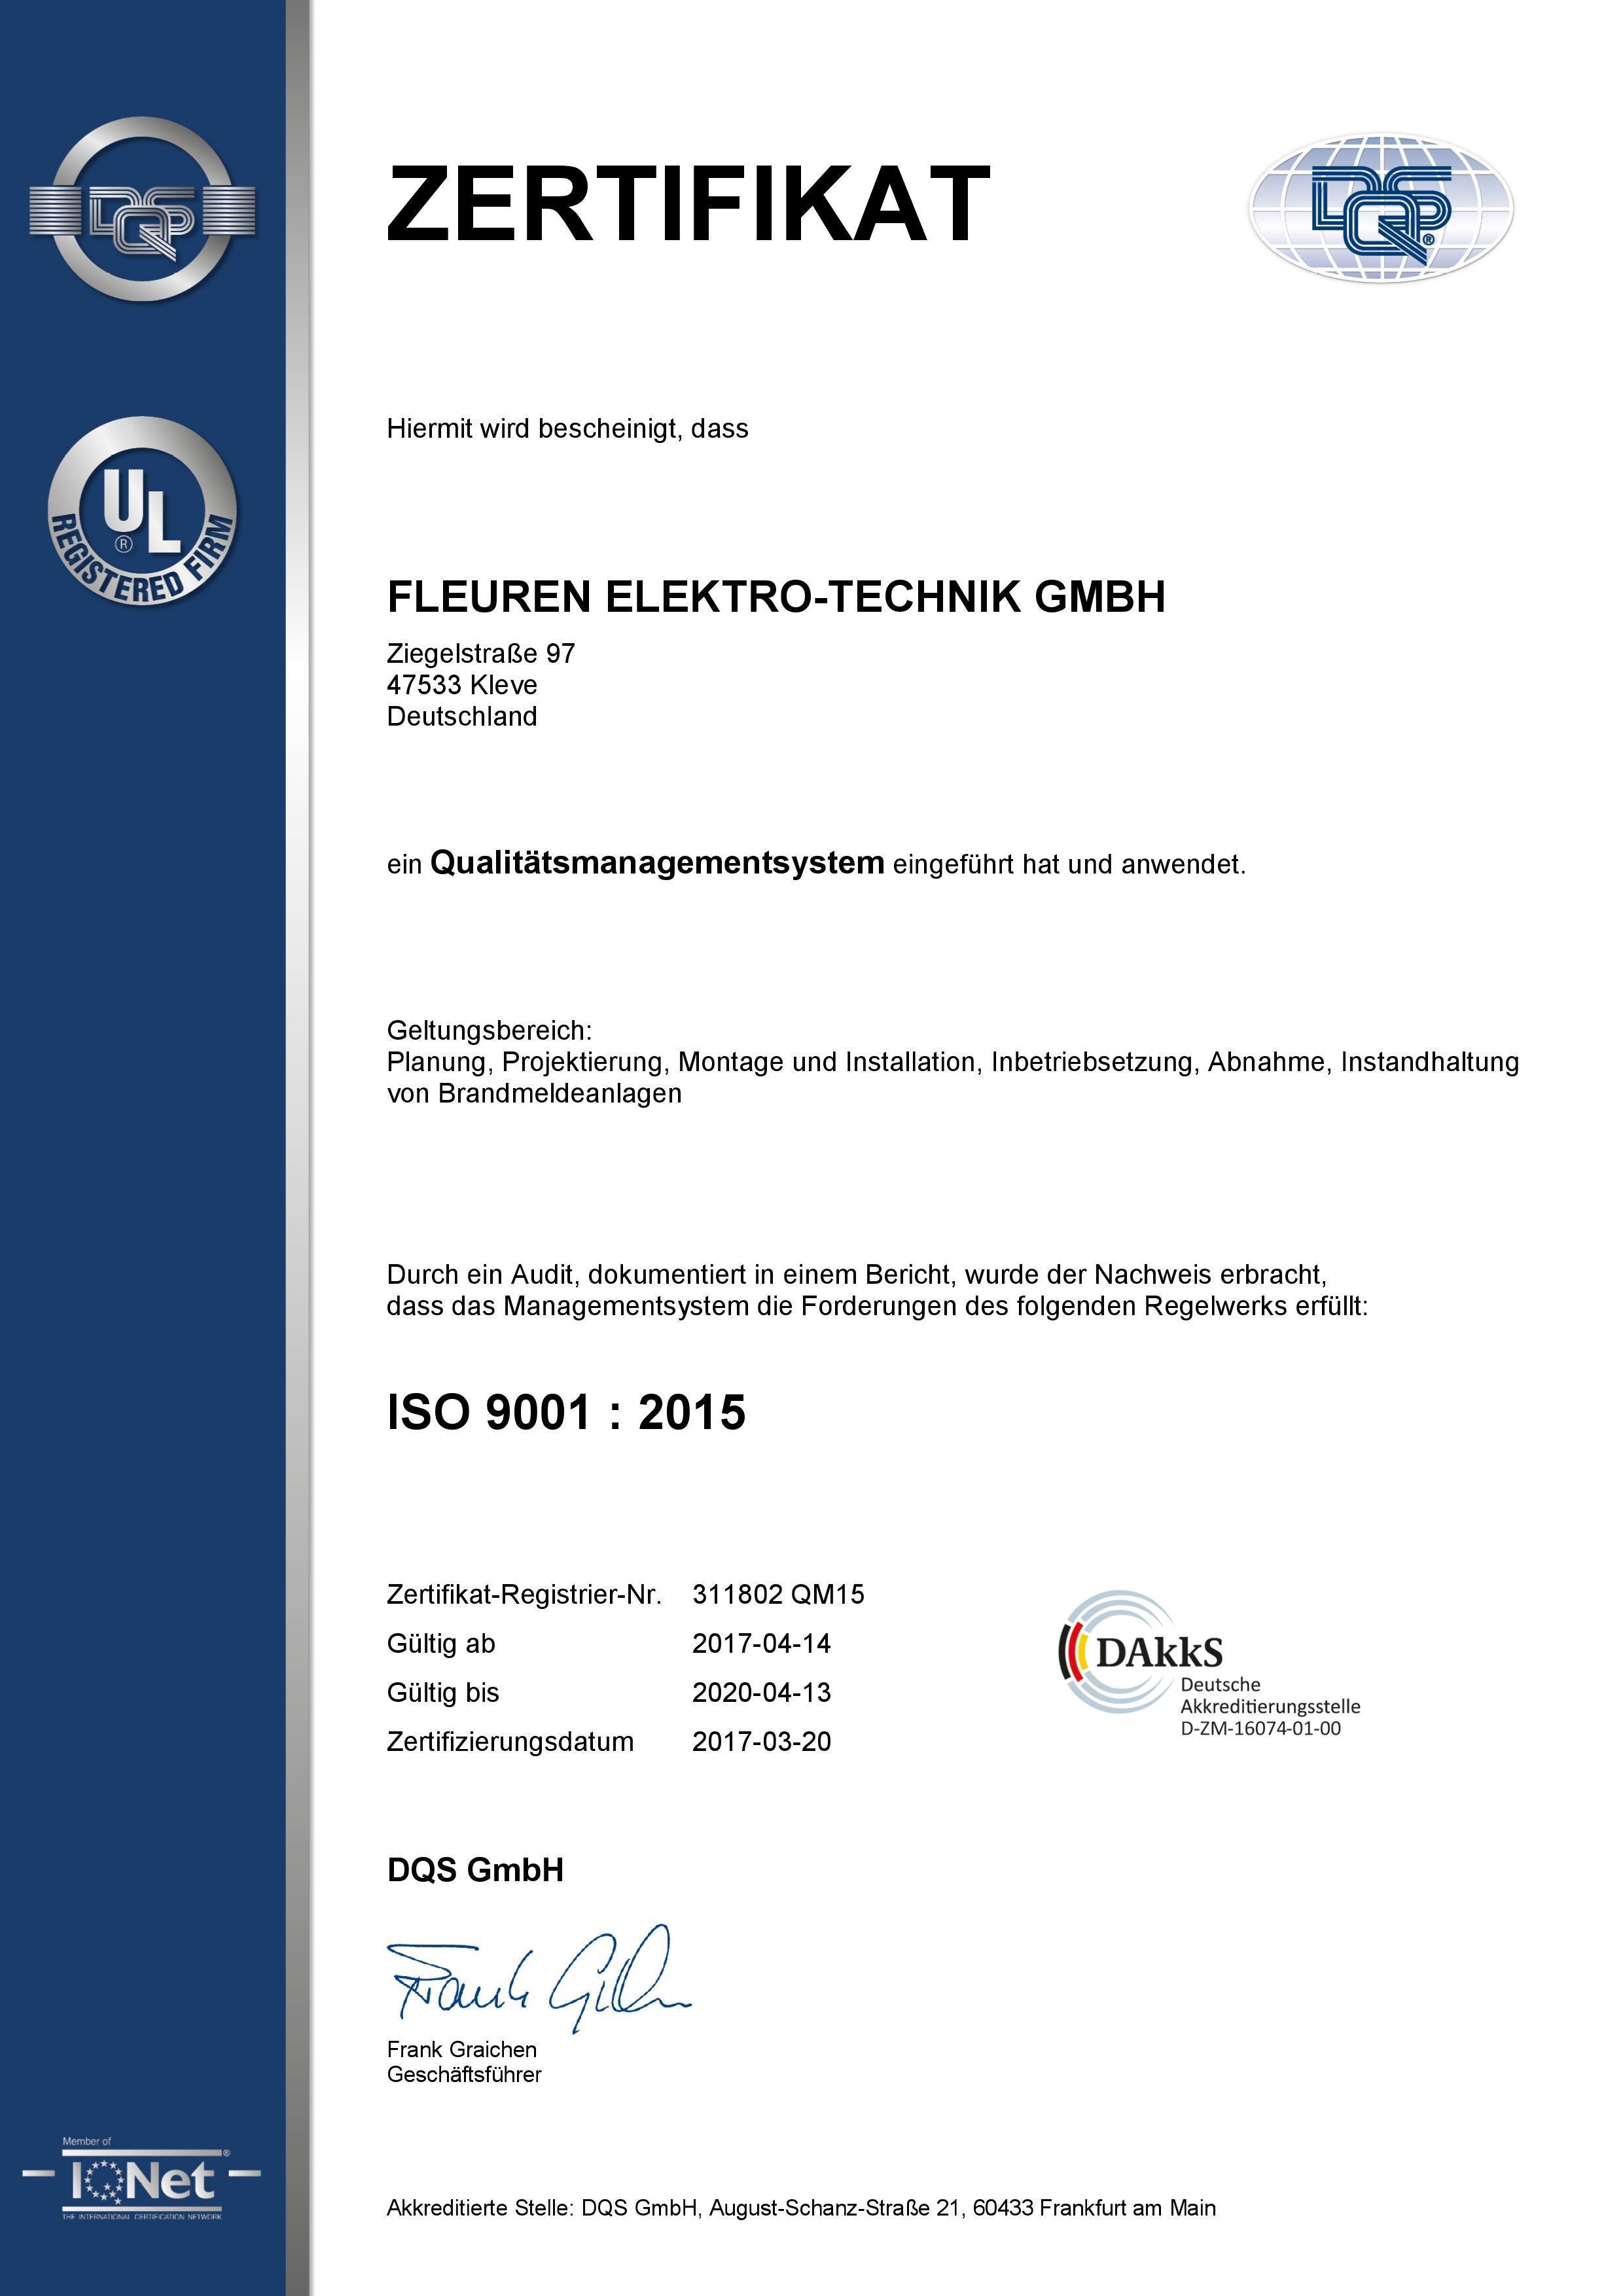 ISO-9001-Zertifikat-FleurenElektro-Technik-GmbH.jpg